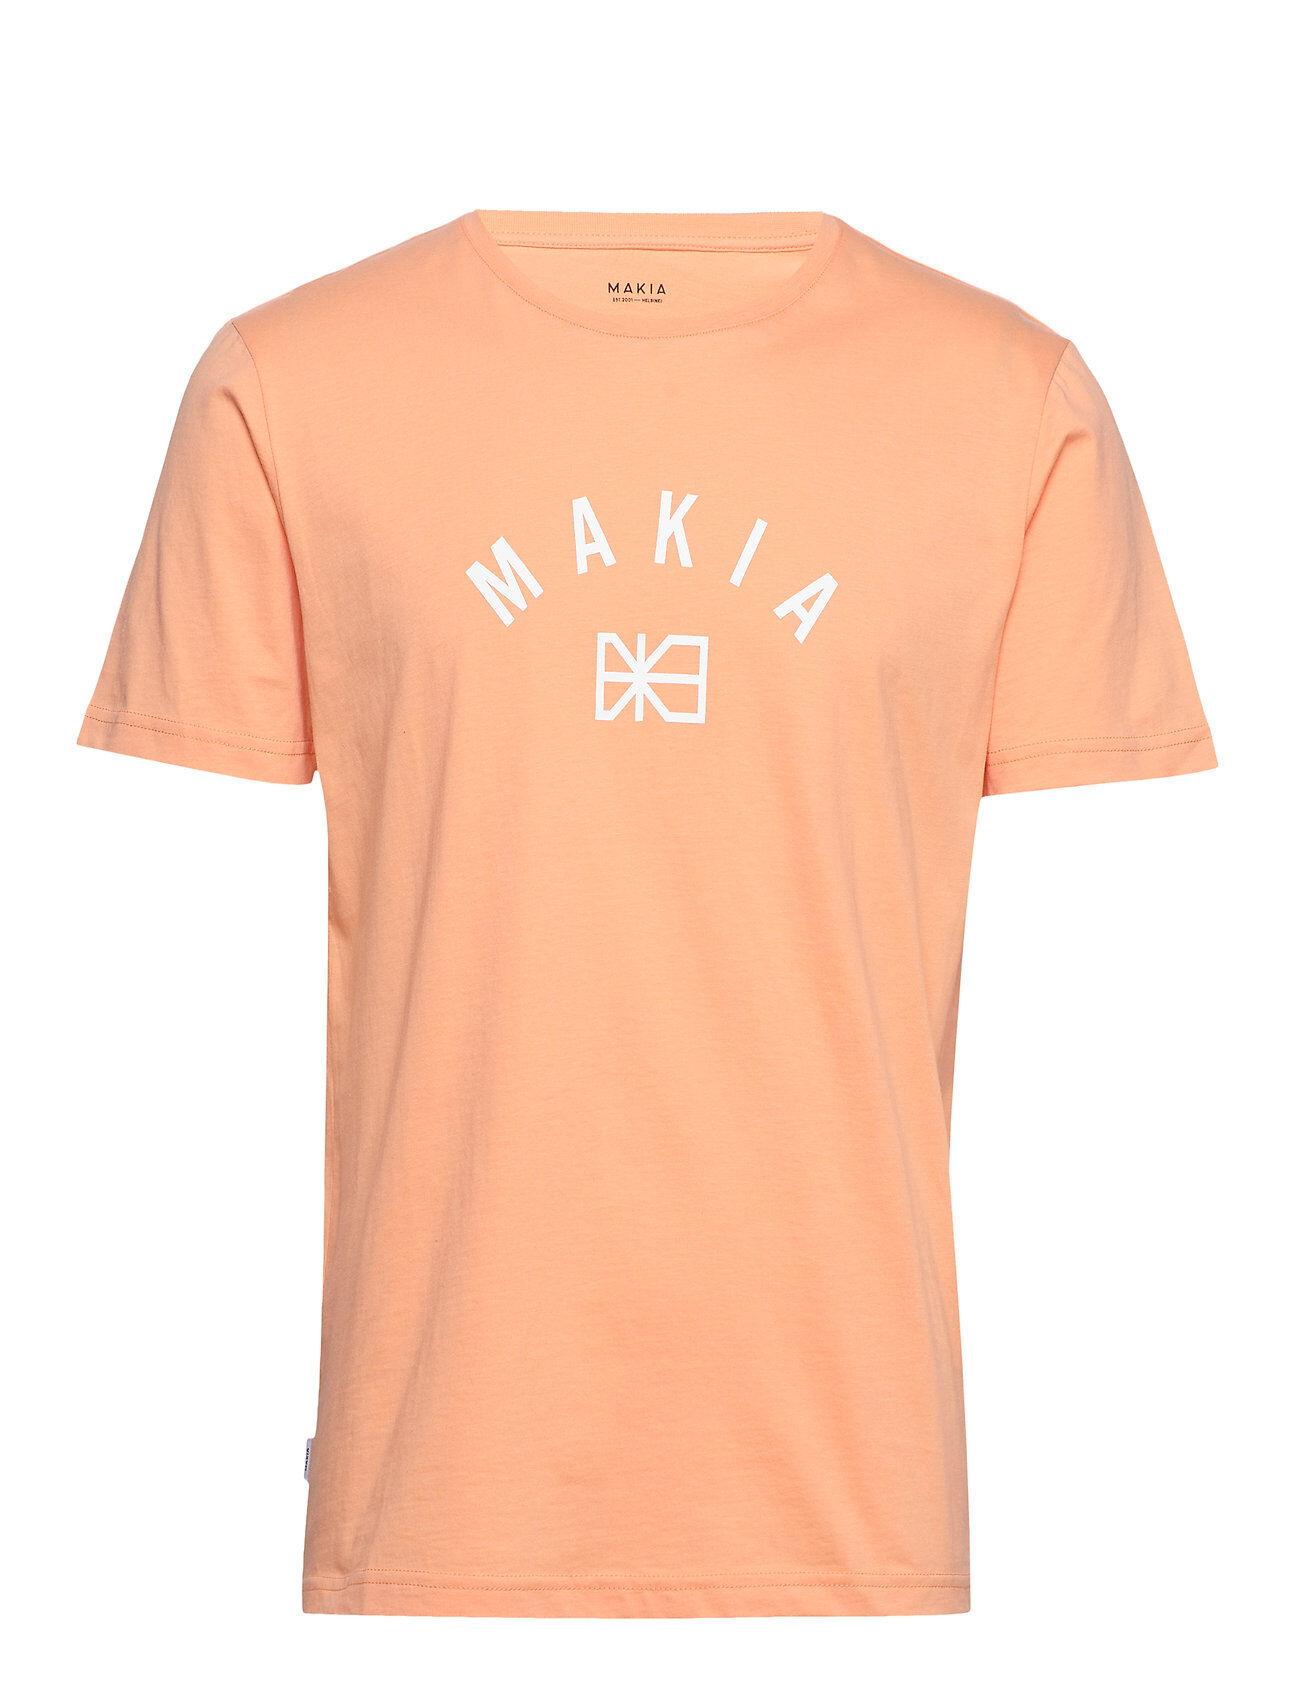 Makia Brand T-Shirt T-shirts Short-sleeved Oranssi Makia